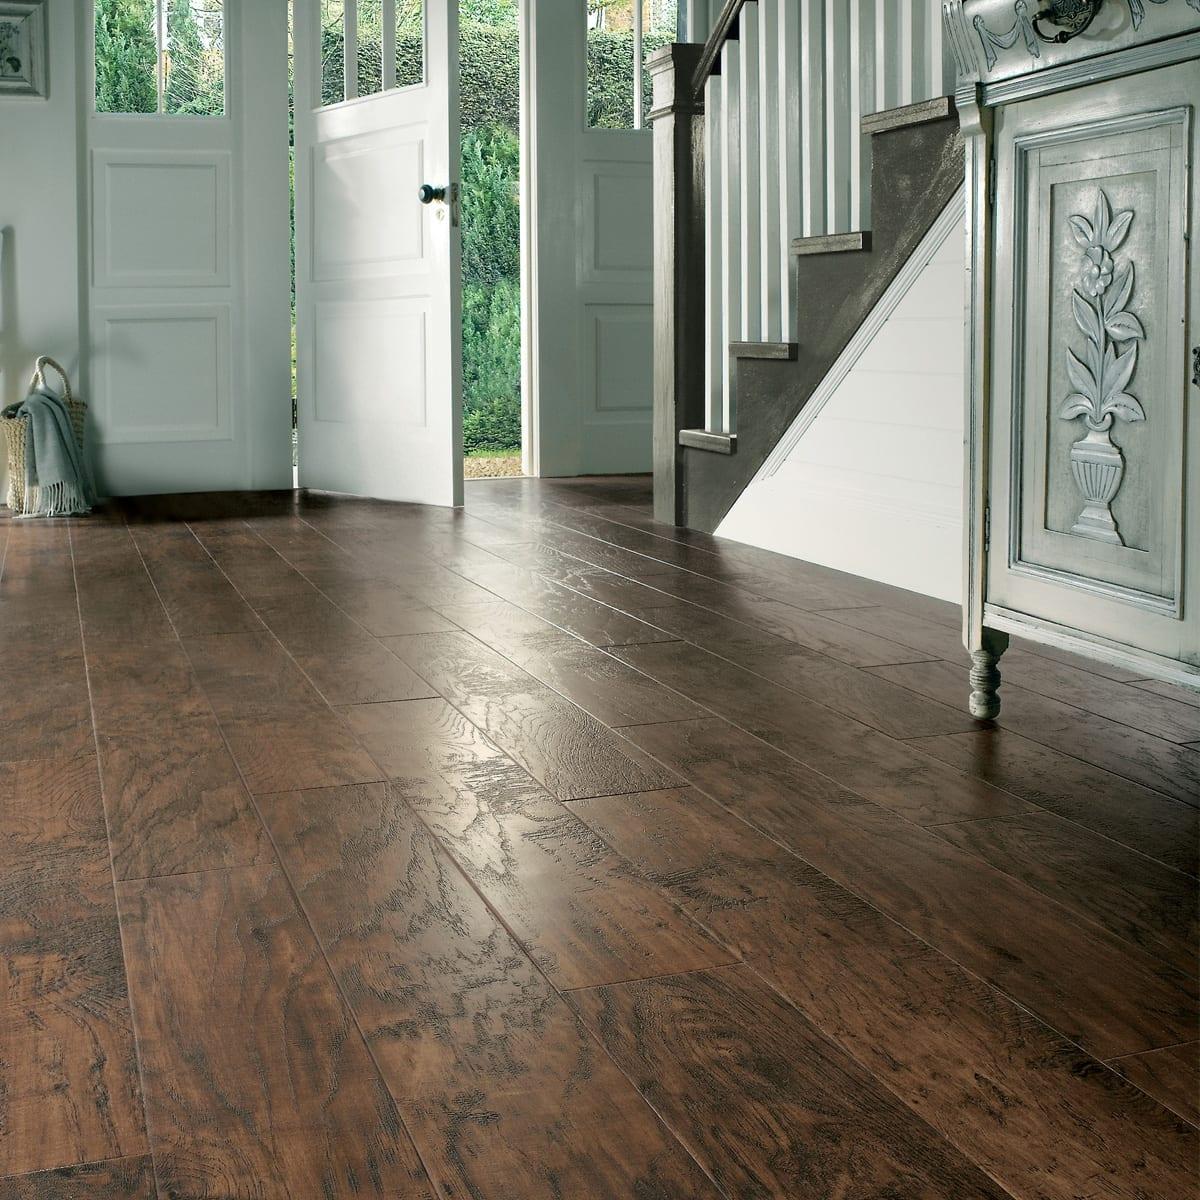 Karndean Art Select Handcrafted Vinyl Plank Flooring